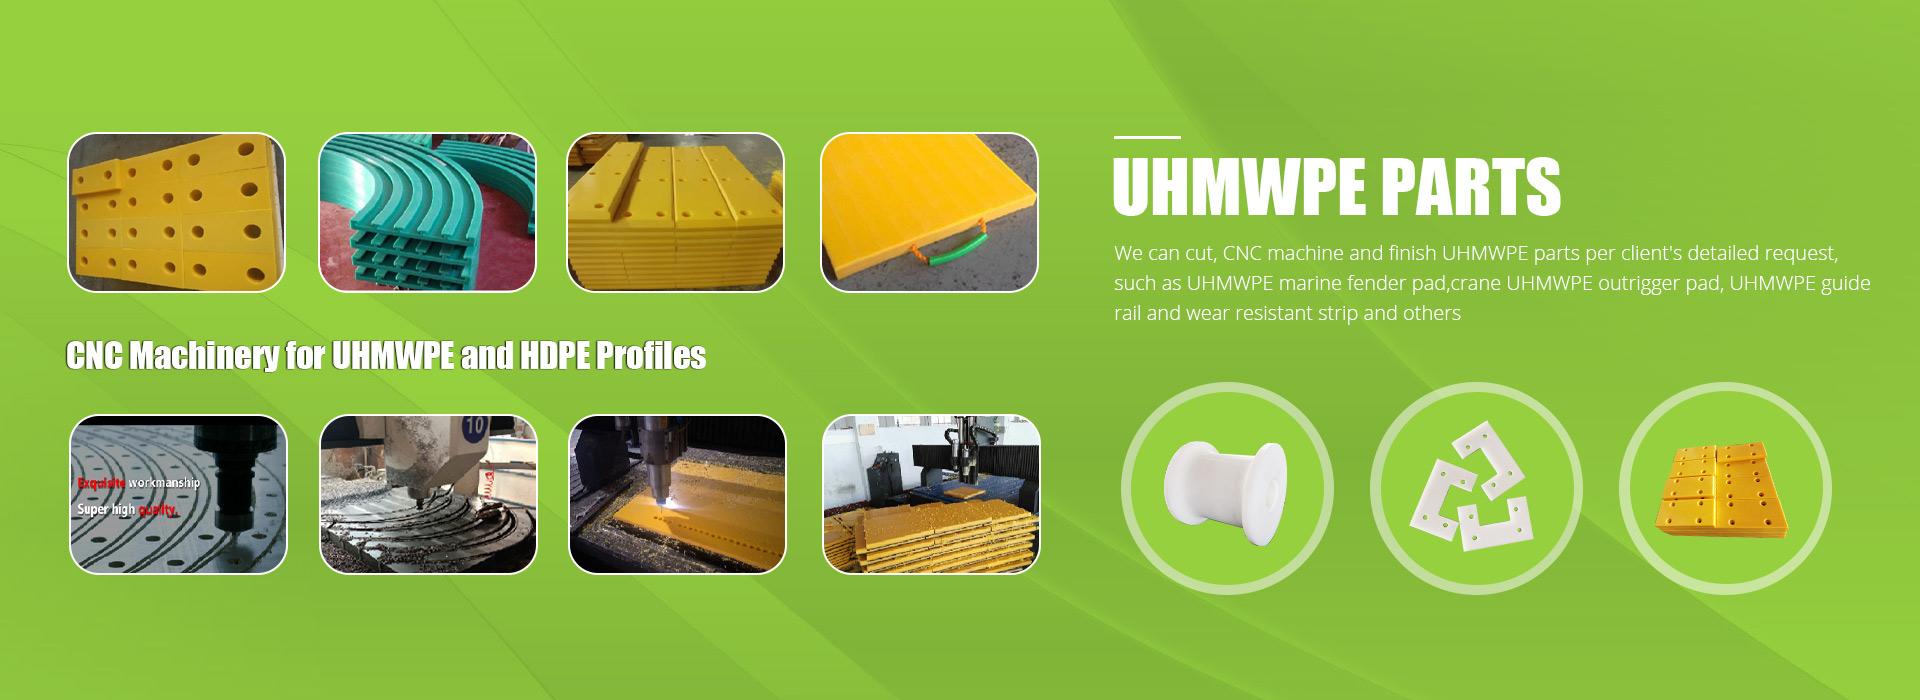 UHMWPE Profiles